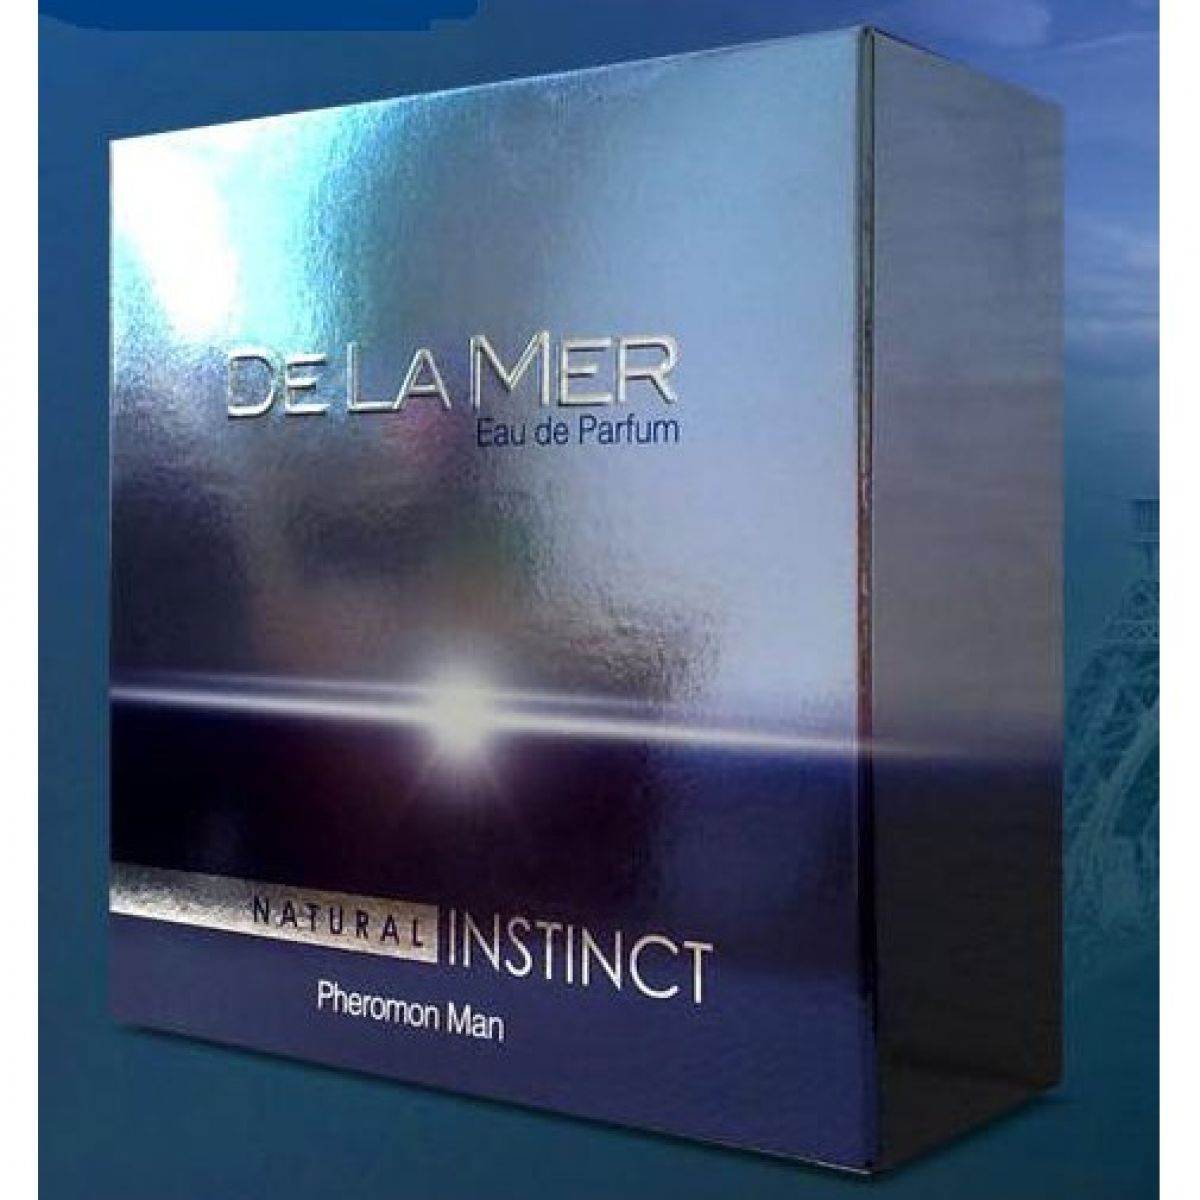 Парфюмерная вода с феромонами Natural Instinct De La Mer 100 мл